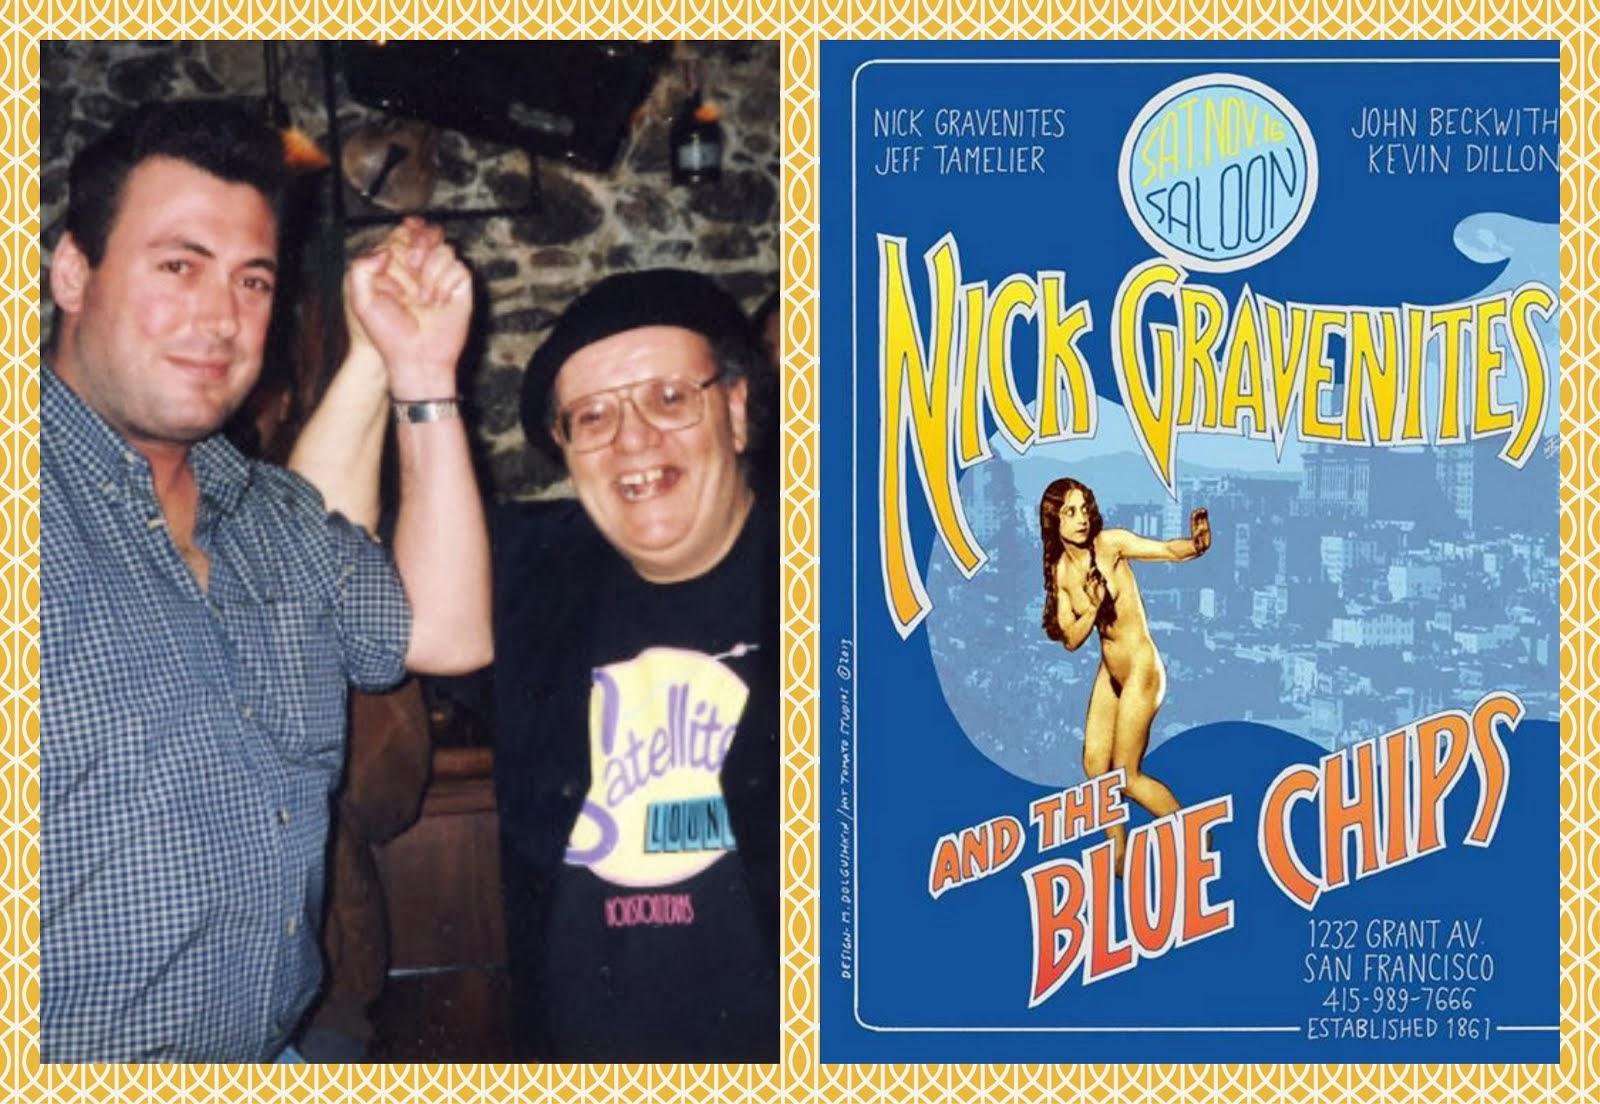 O Ελληνοαμερικανός bluesman Nick Gravenites: